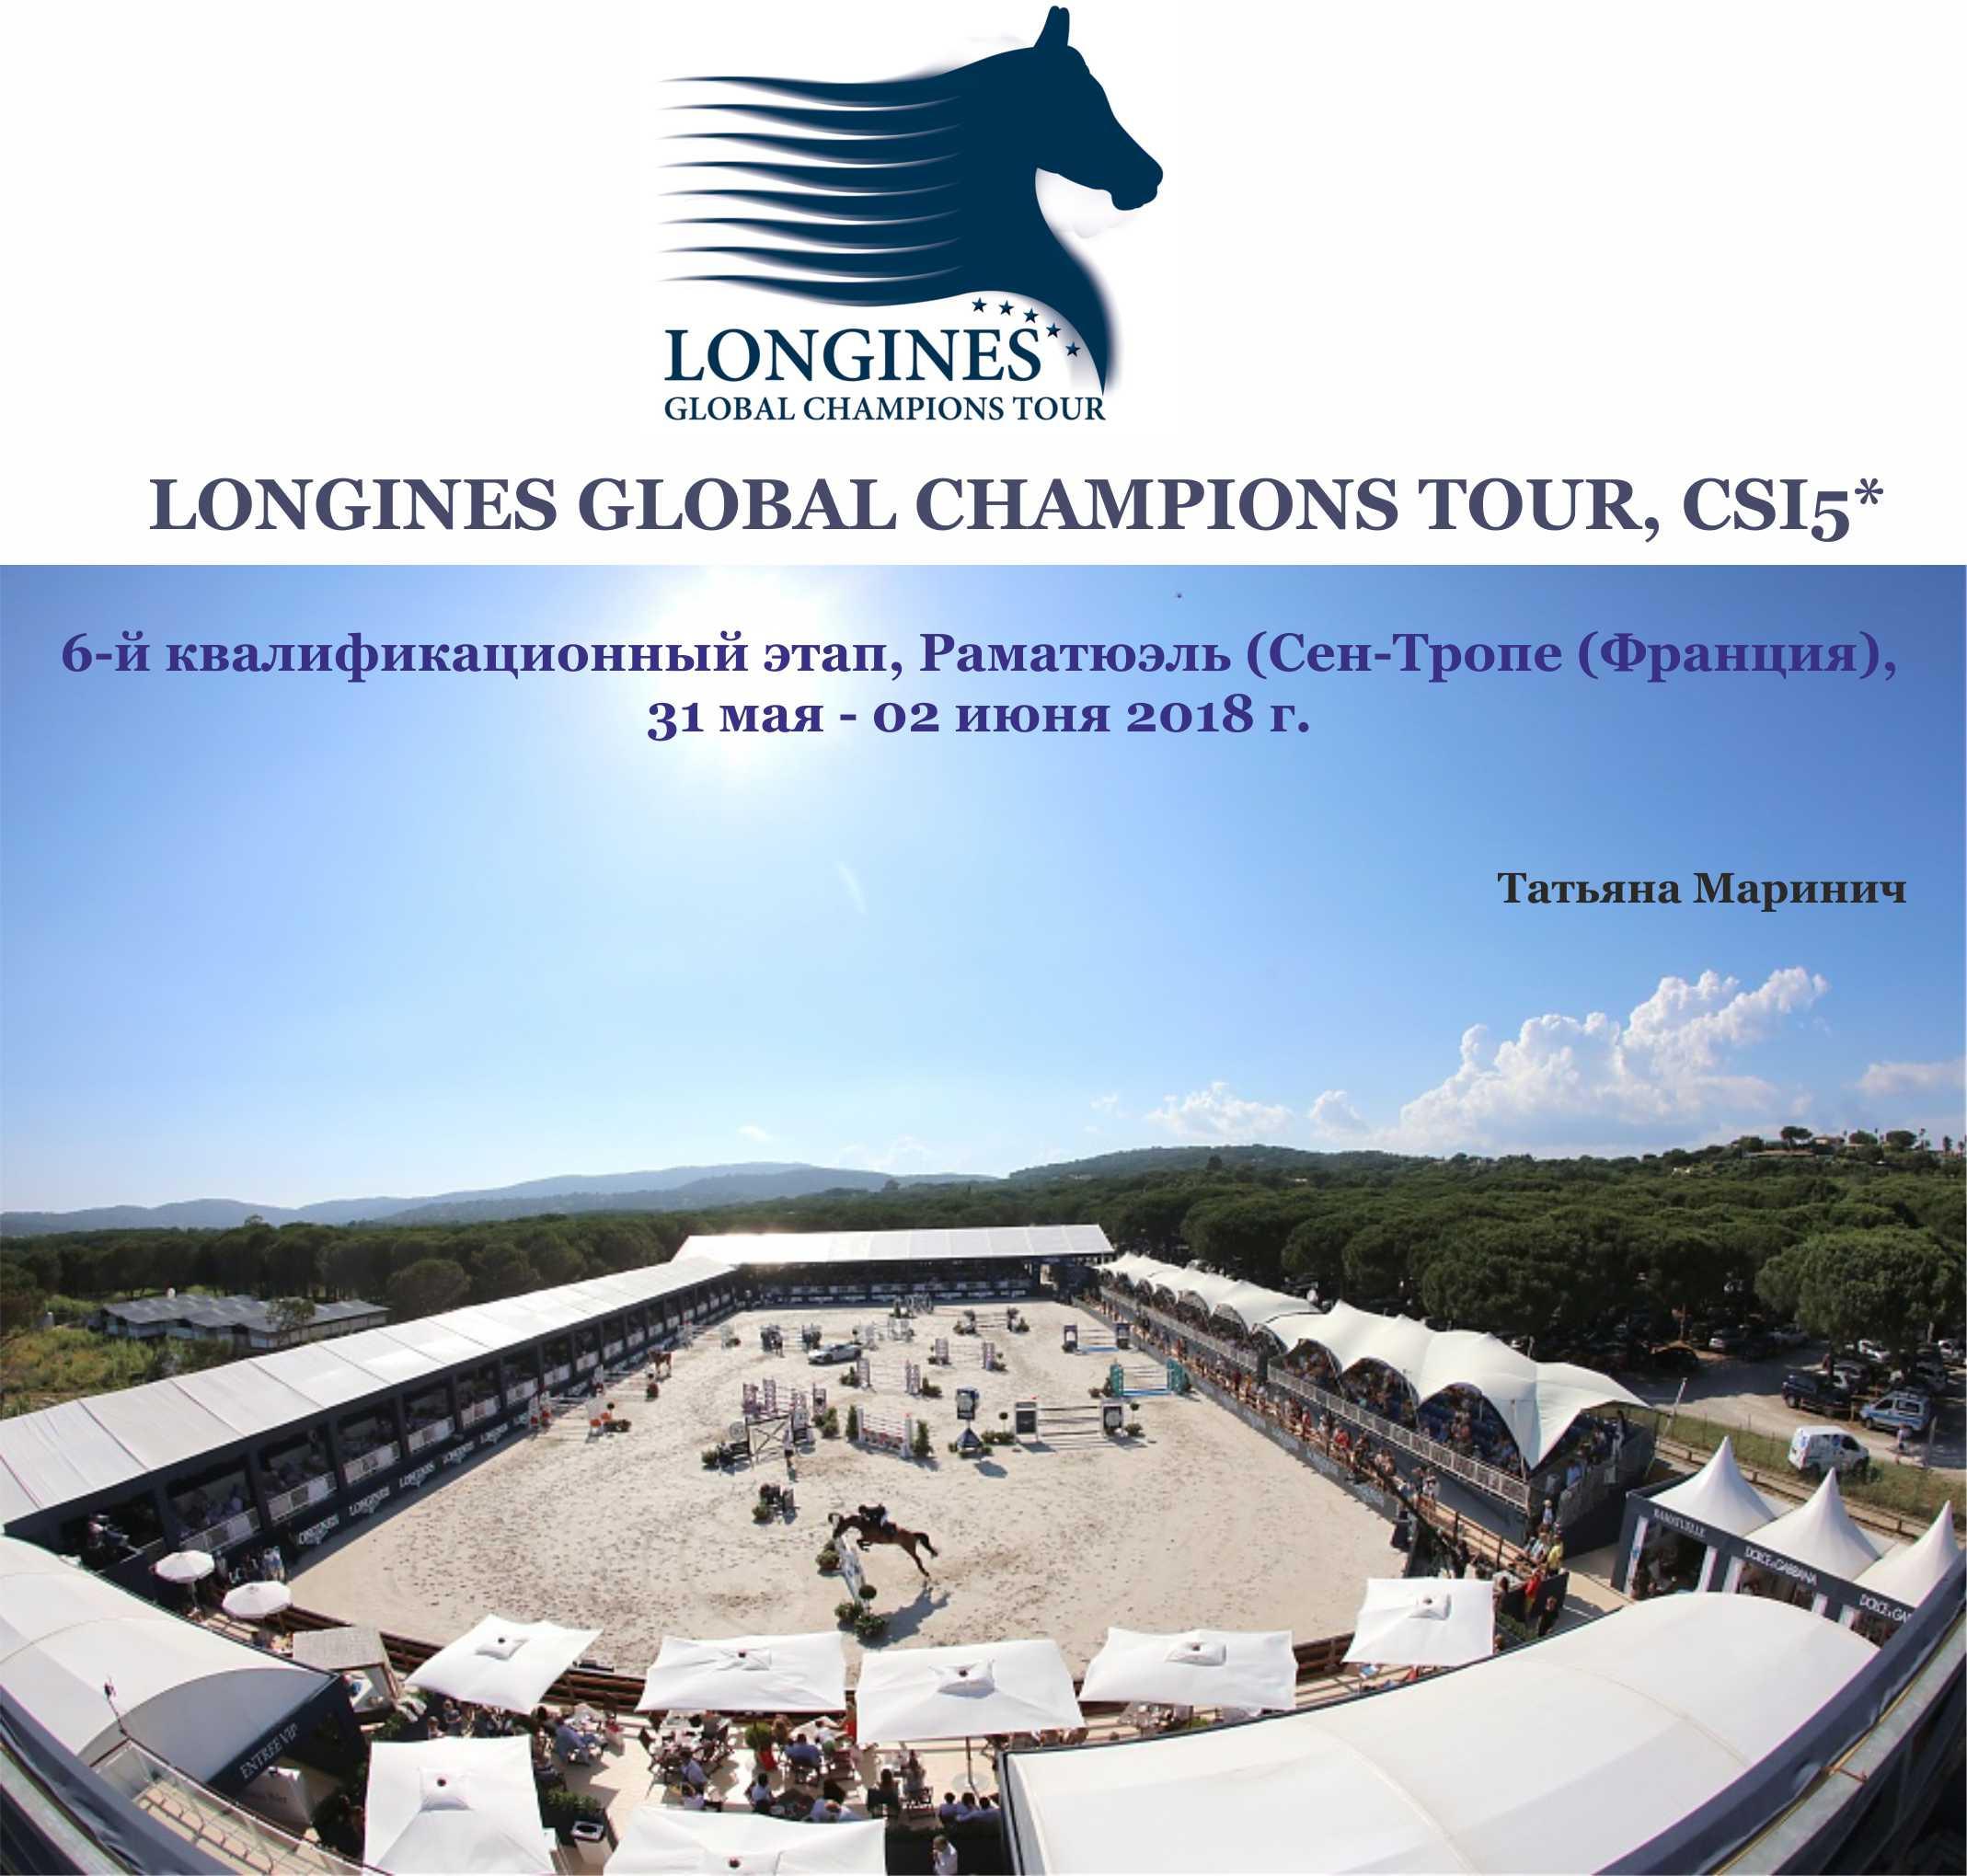 Longines Global Champions Tour_6-й этап, Раматюэль (Сен-Тропе (Франция)_7-й этап, Канны (Франция)_8-й этап, Кашкайш/Эшторил (Португалия)_(выпуск журнала №41)